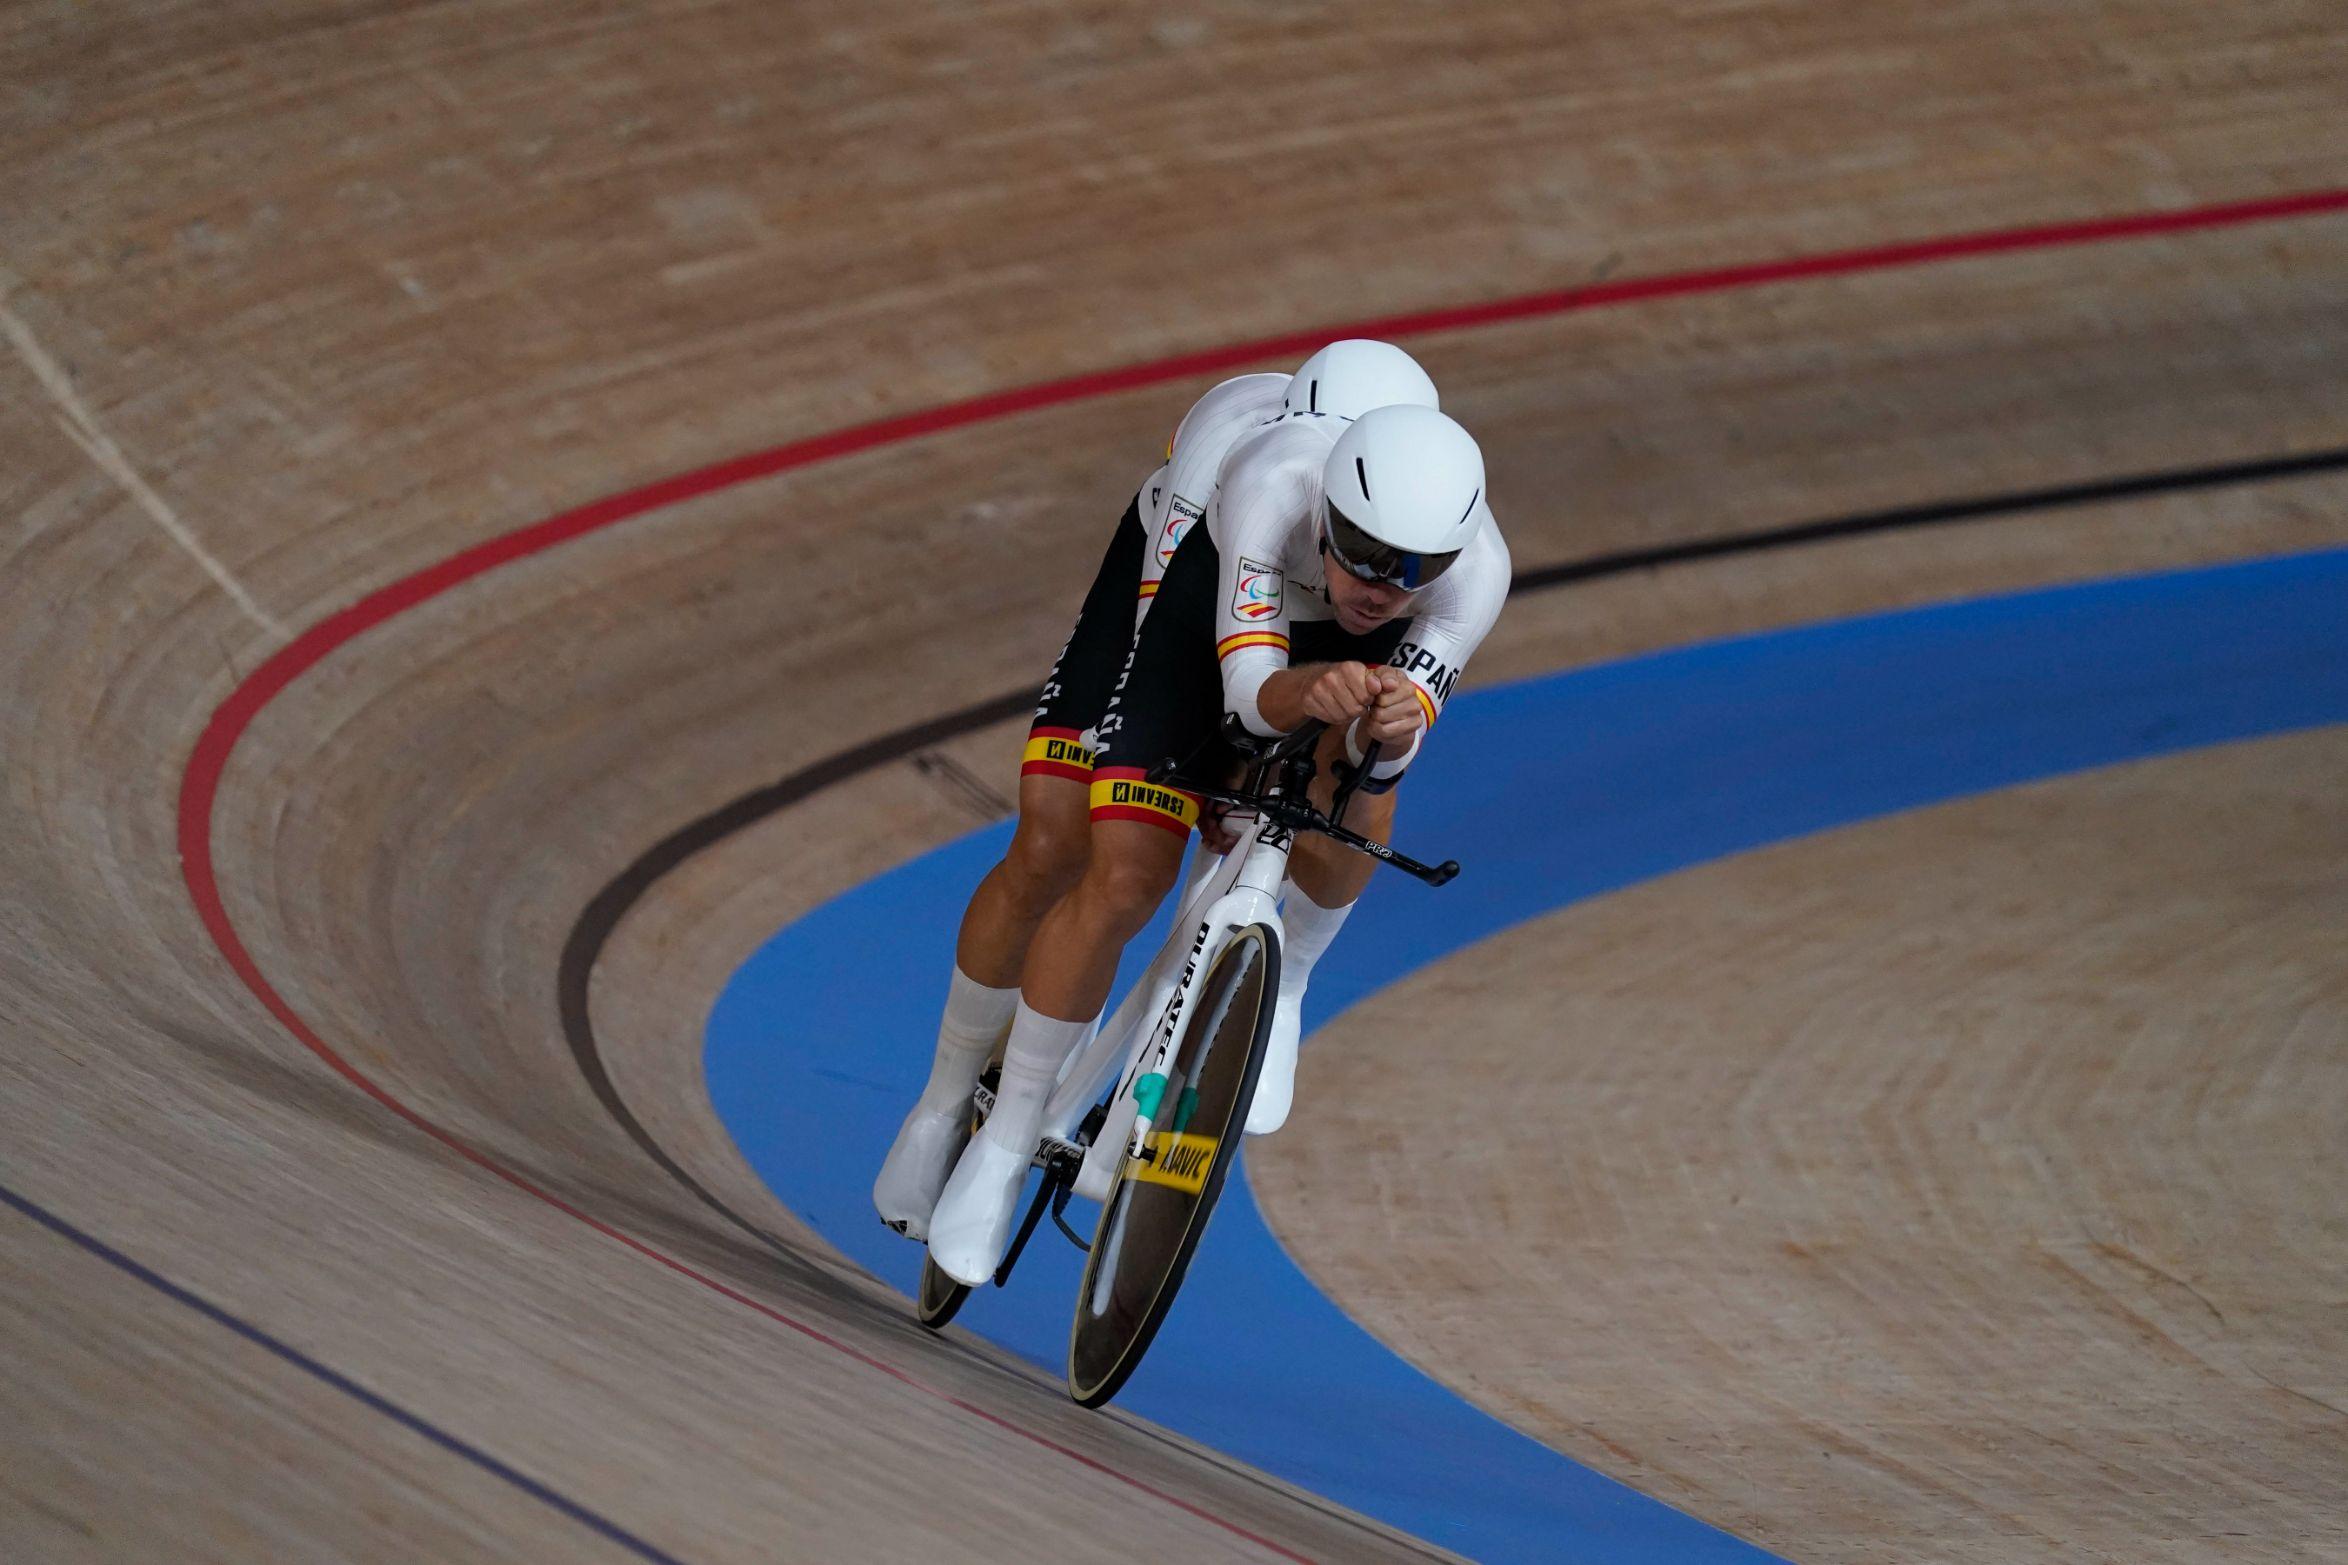 #TeamESPciclismo - Juegos Paralímpicos Tokio, pista